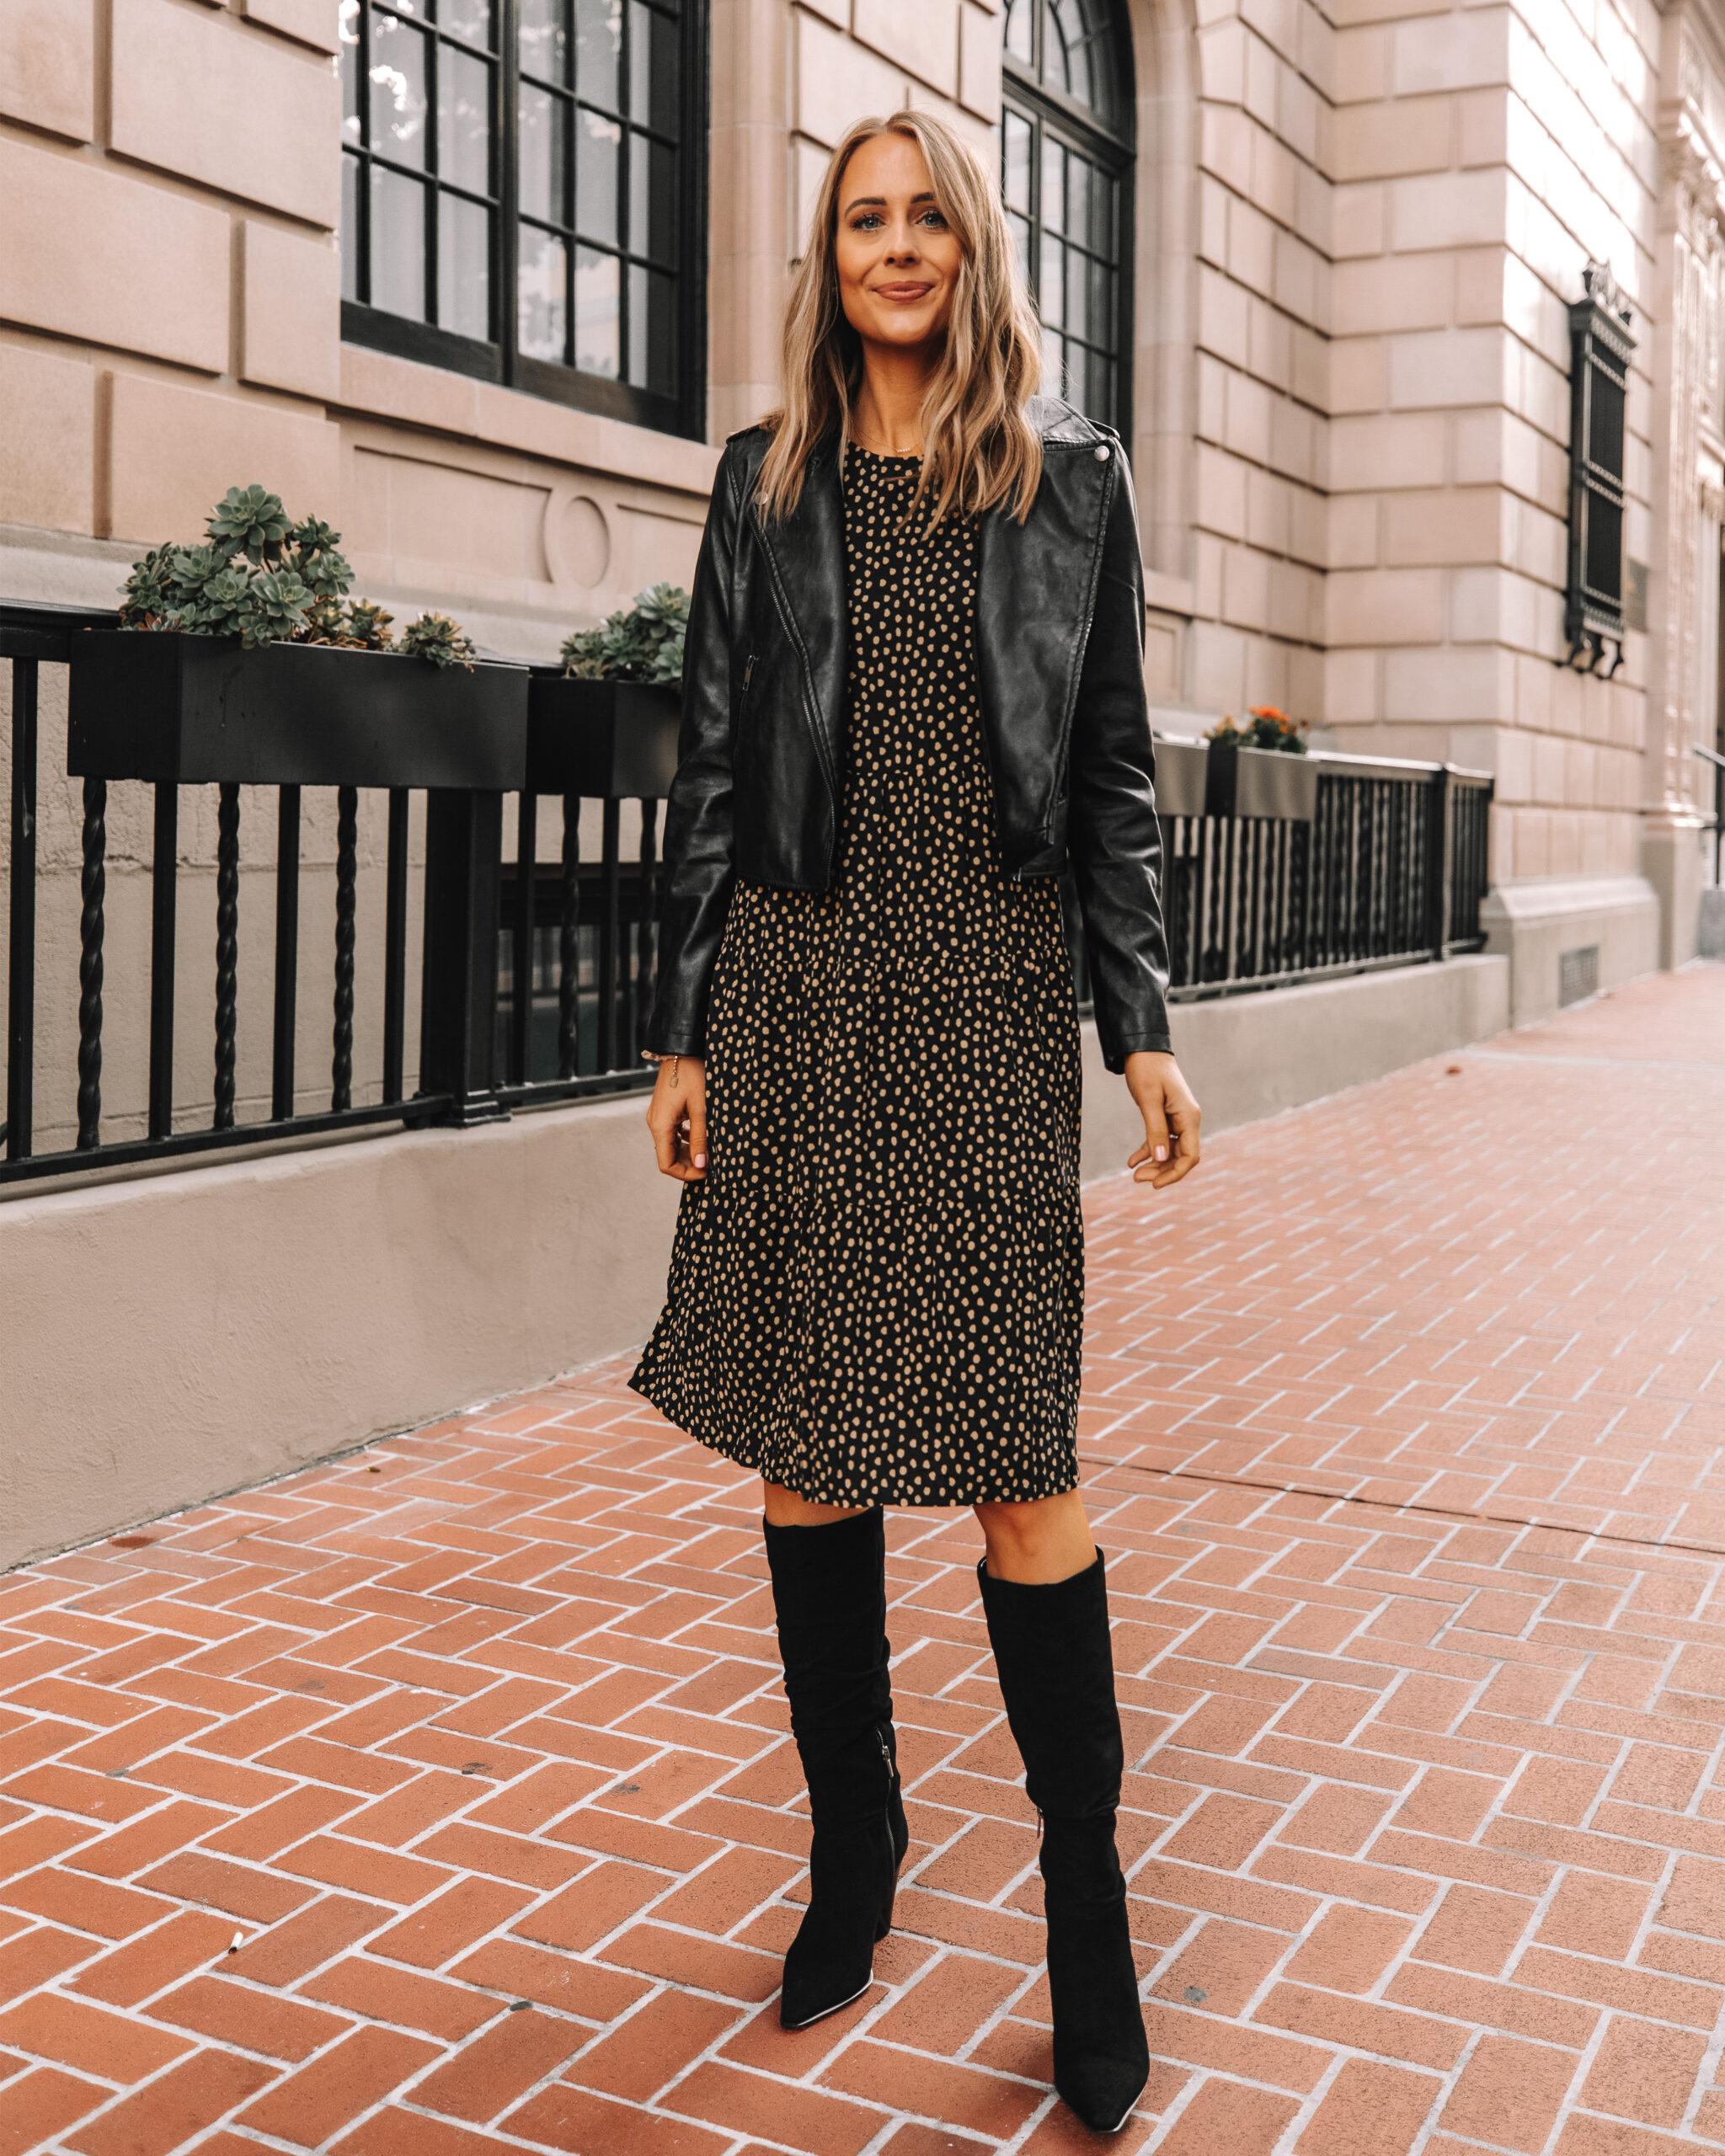 Fashion Jackson Wearing Amazon The Drop Polka Dot Midi Dress Black Leather Jacket Black Knee High Boots